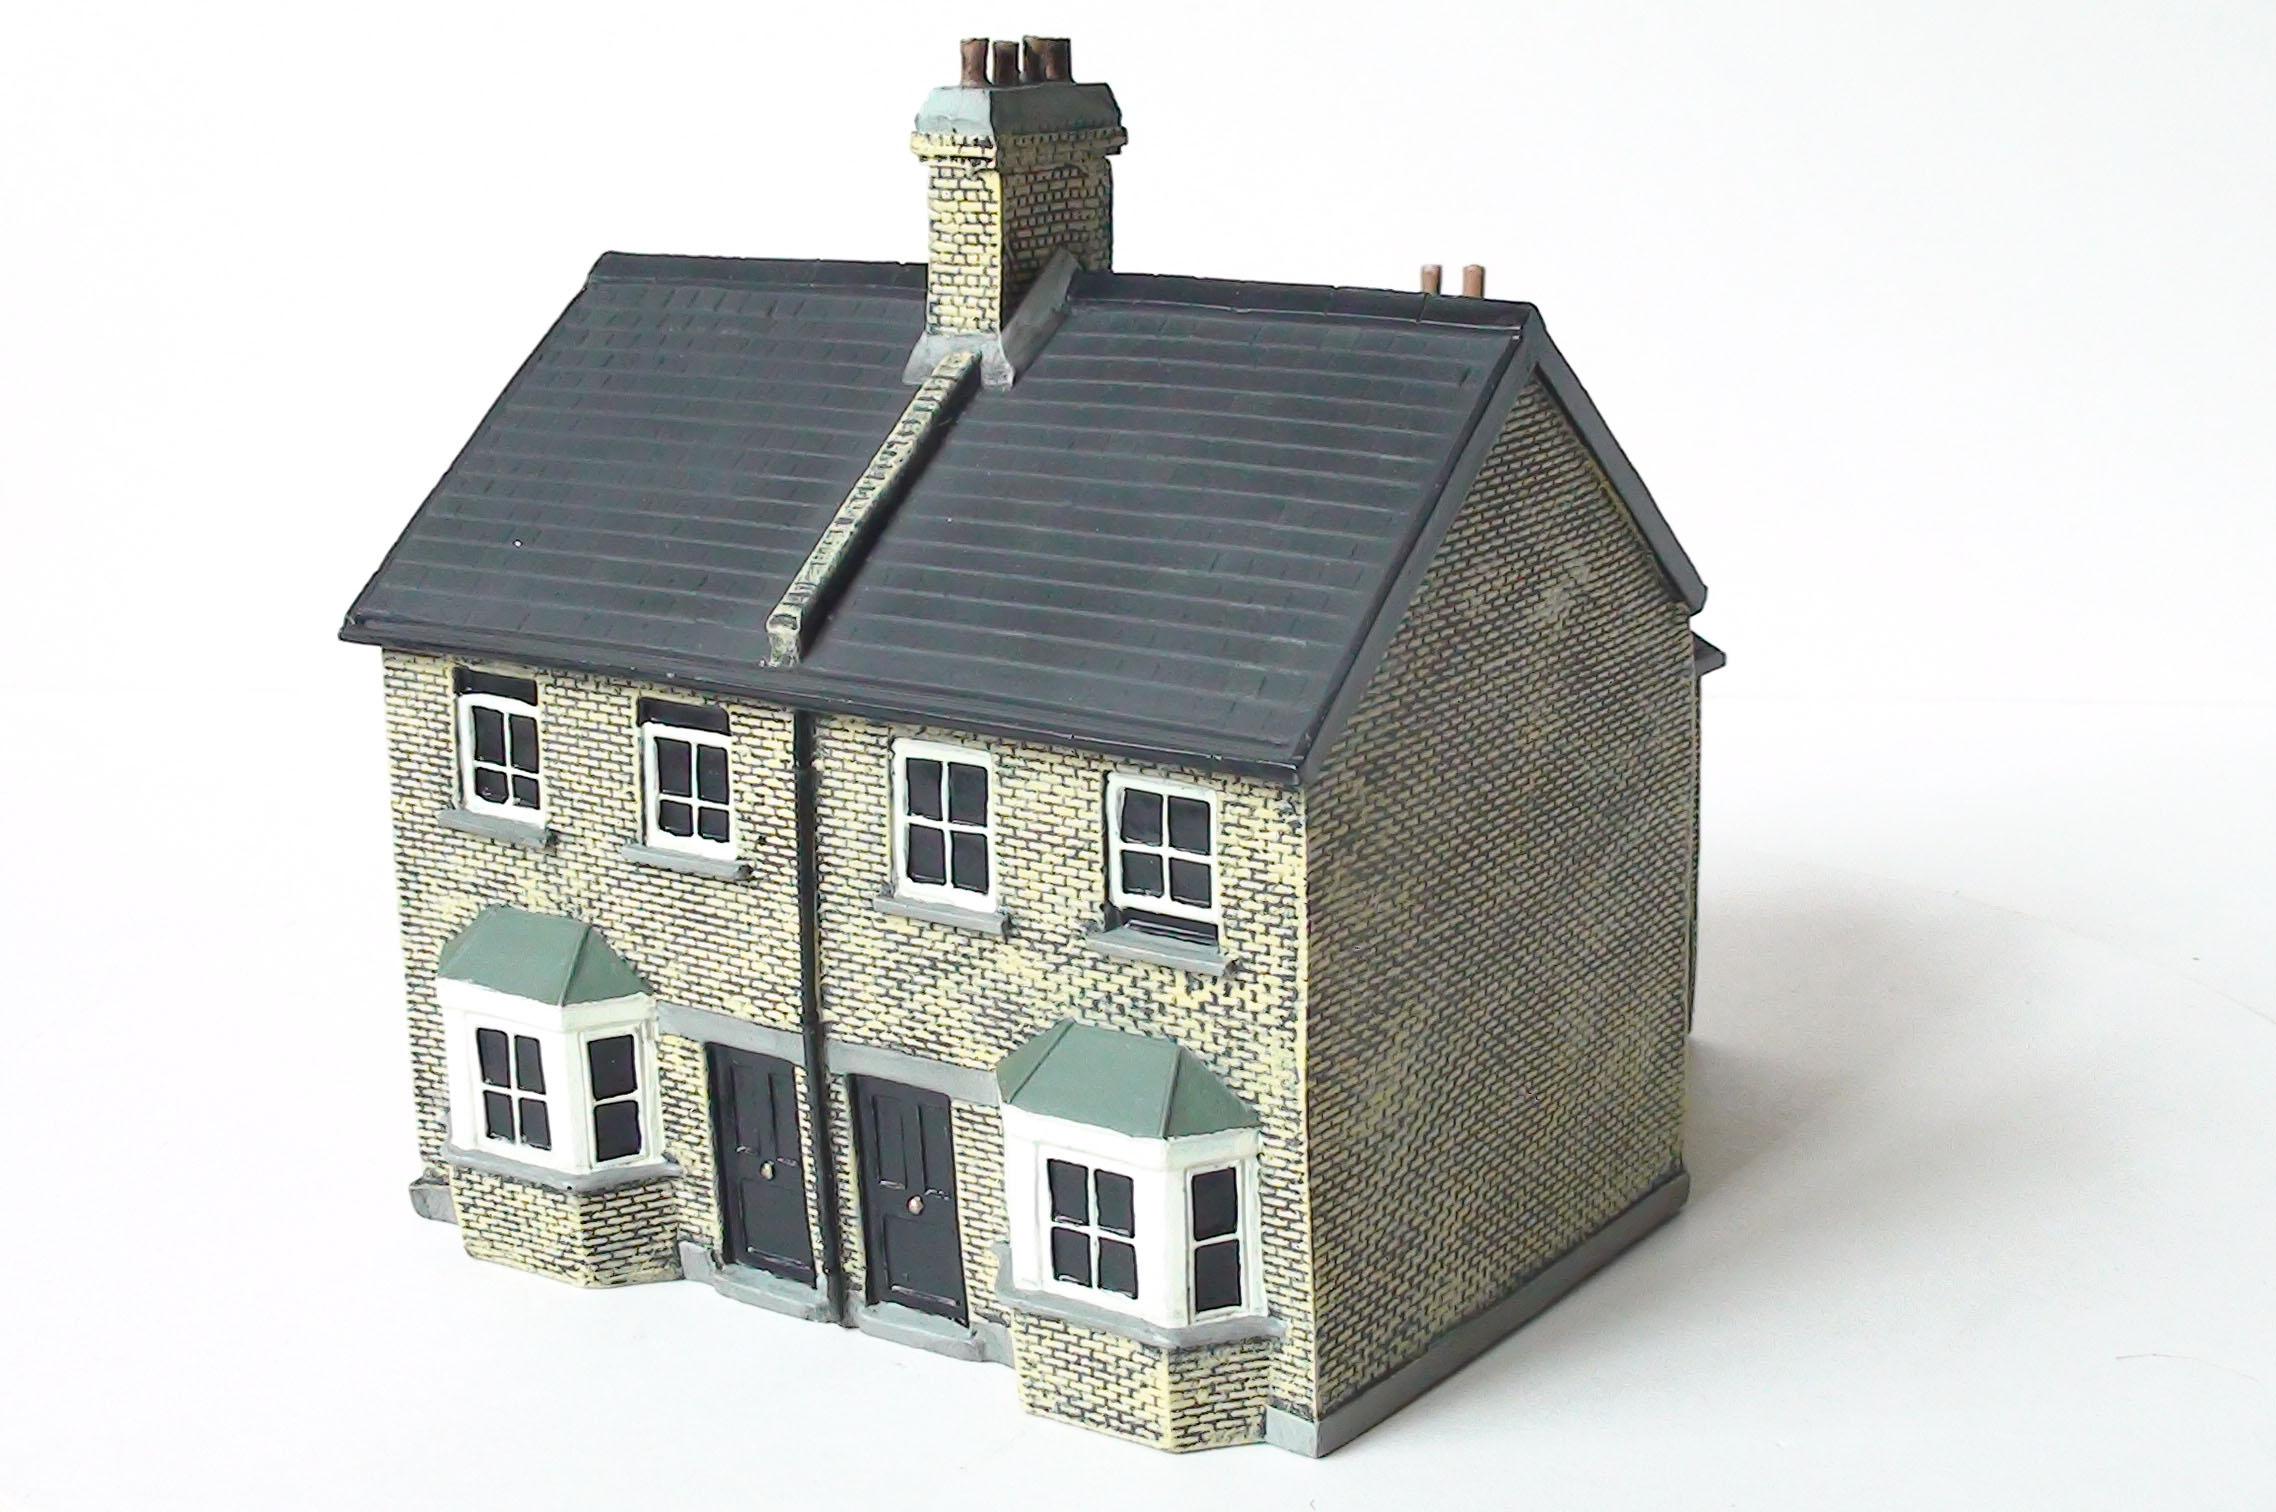 semi detached house clipart - photo #22